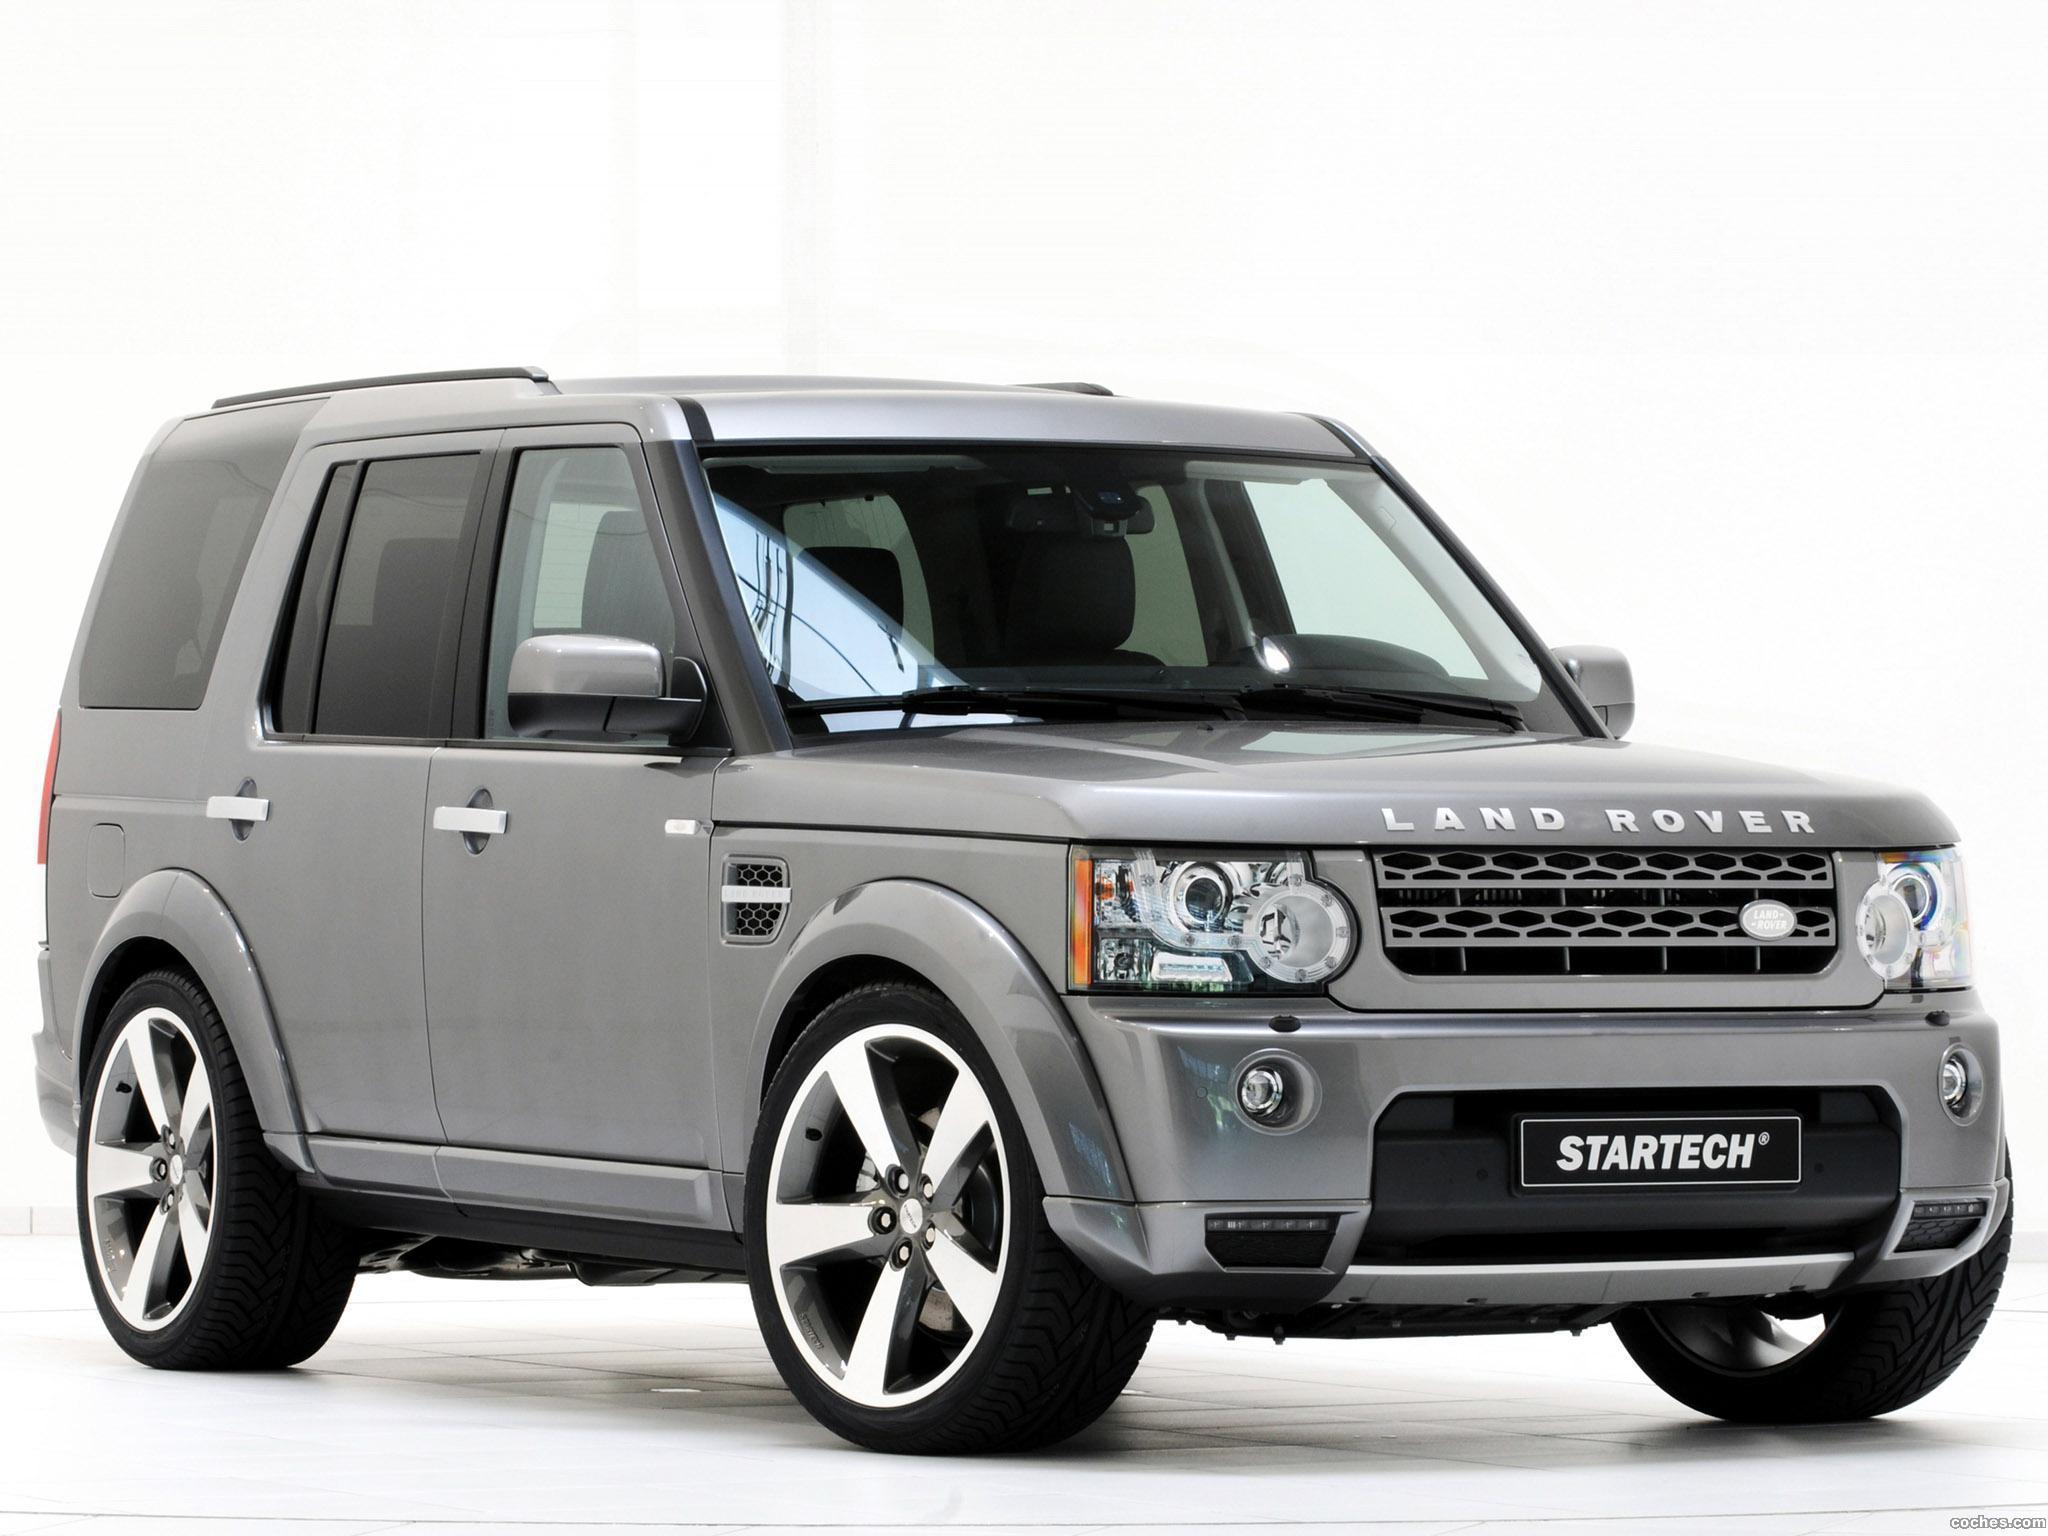 Foto 0 de Startech Land Rover Discovery 4 2011